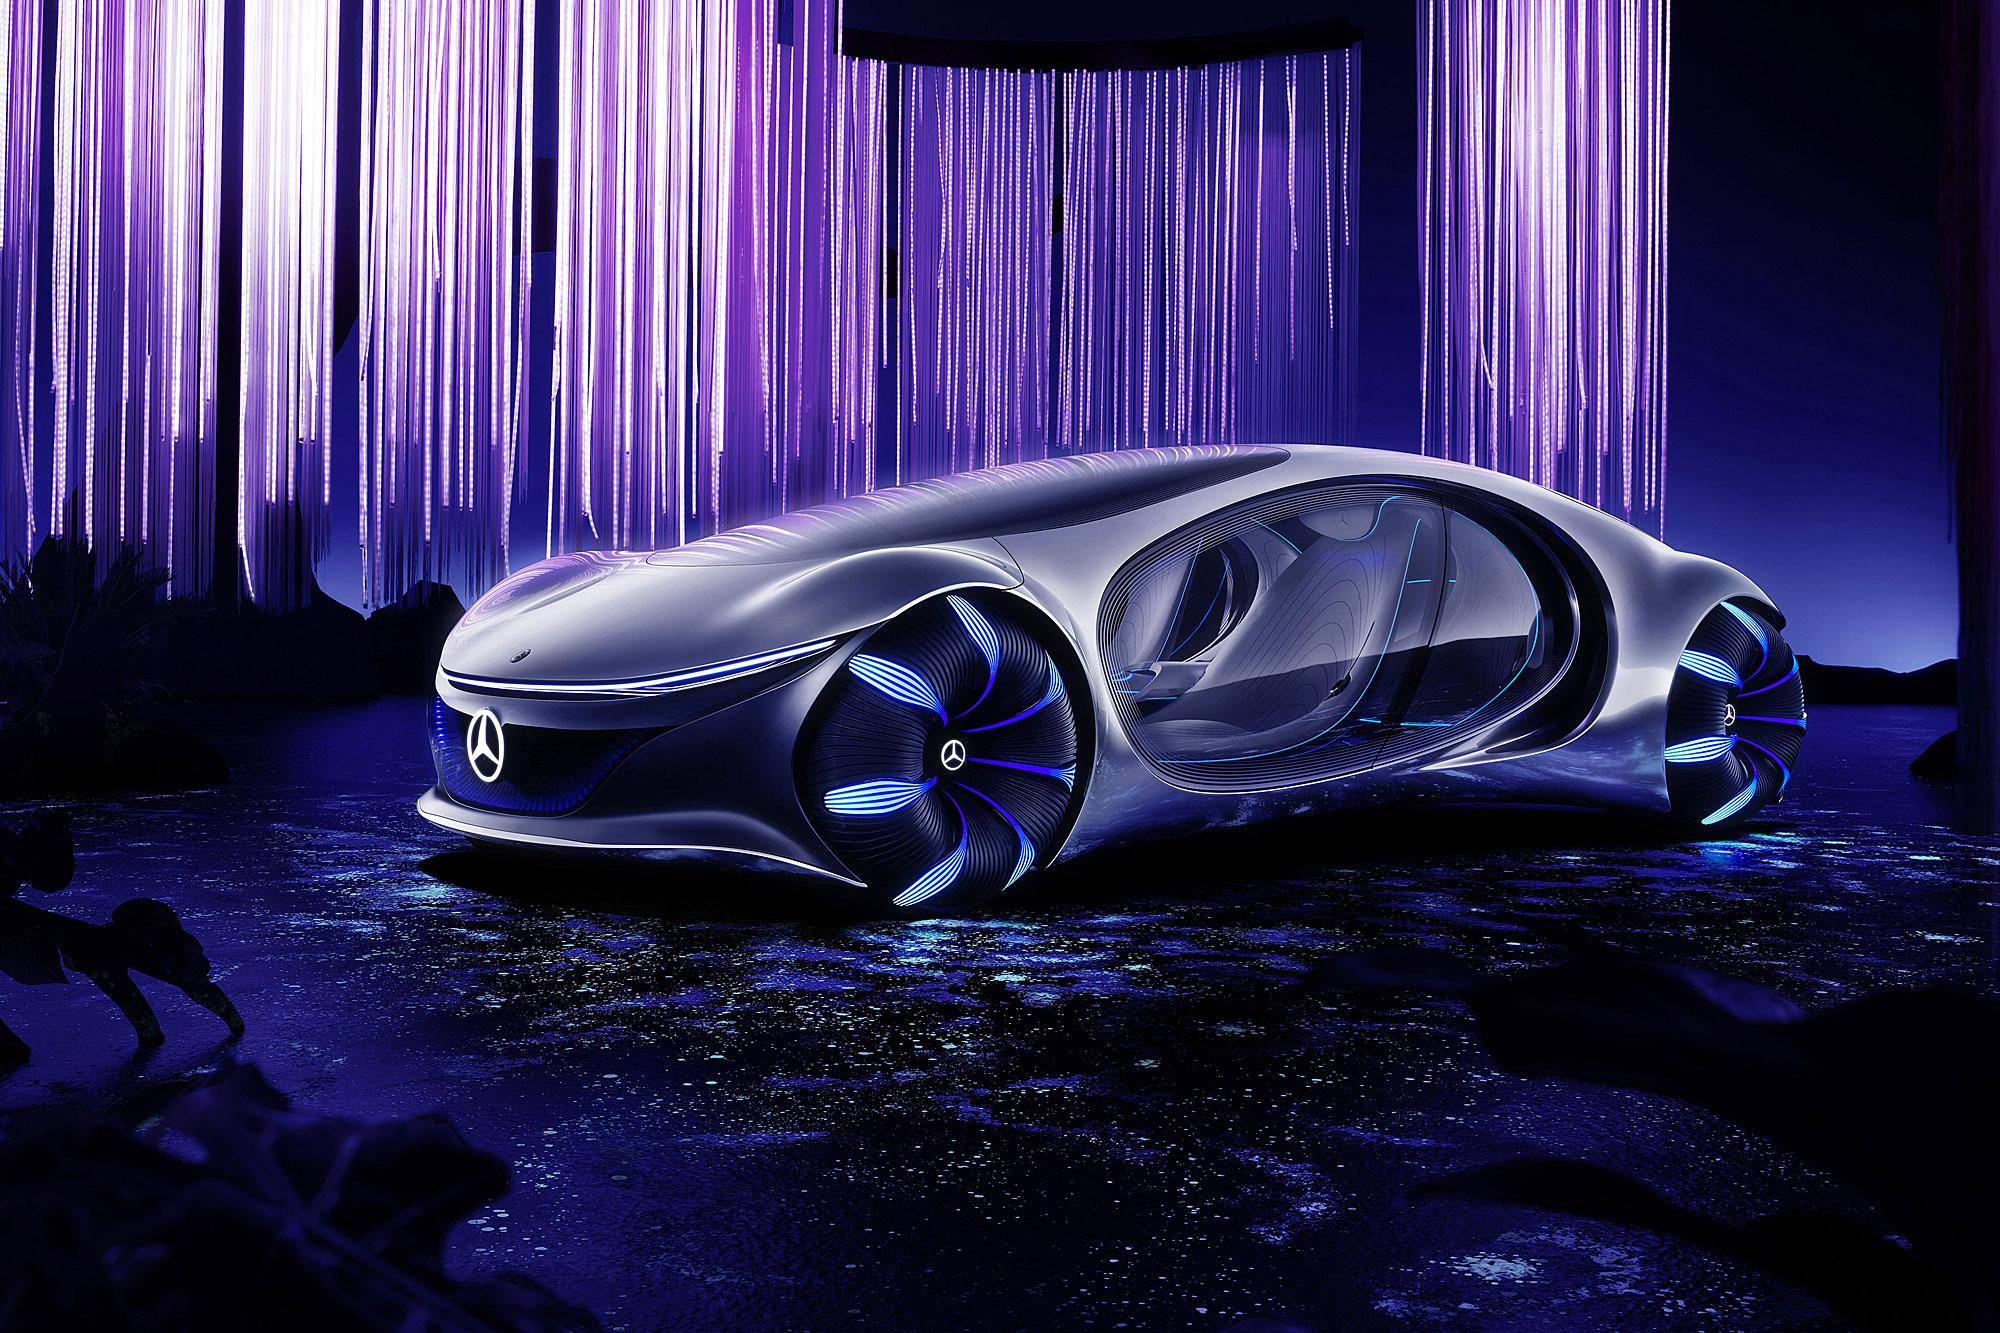 Vision AVTR 為 Mercedes-Benz 與 James Cameron 合作推出的概念作品。